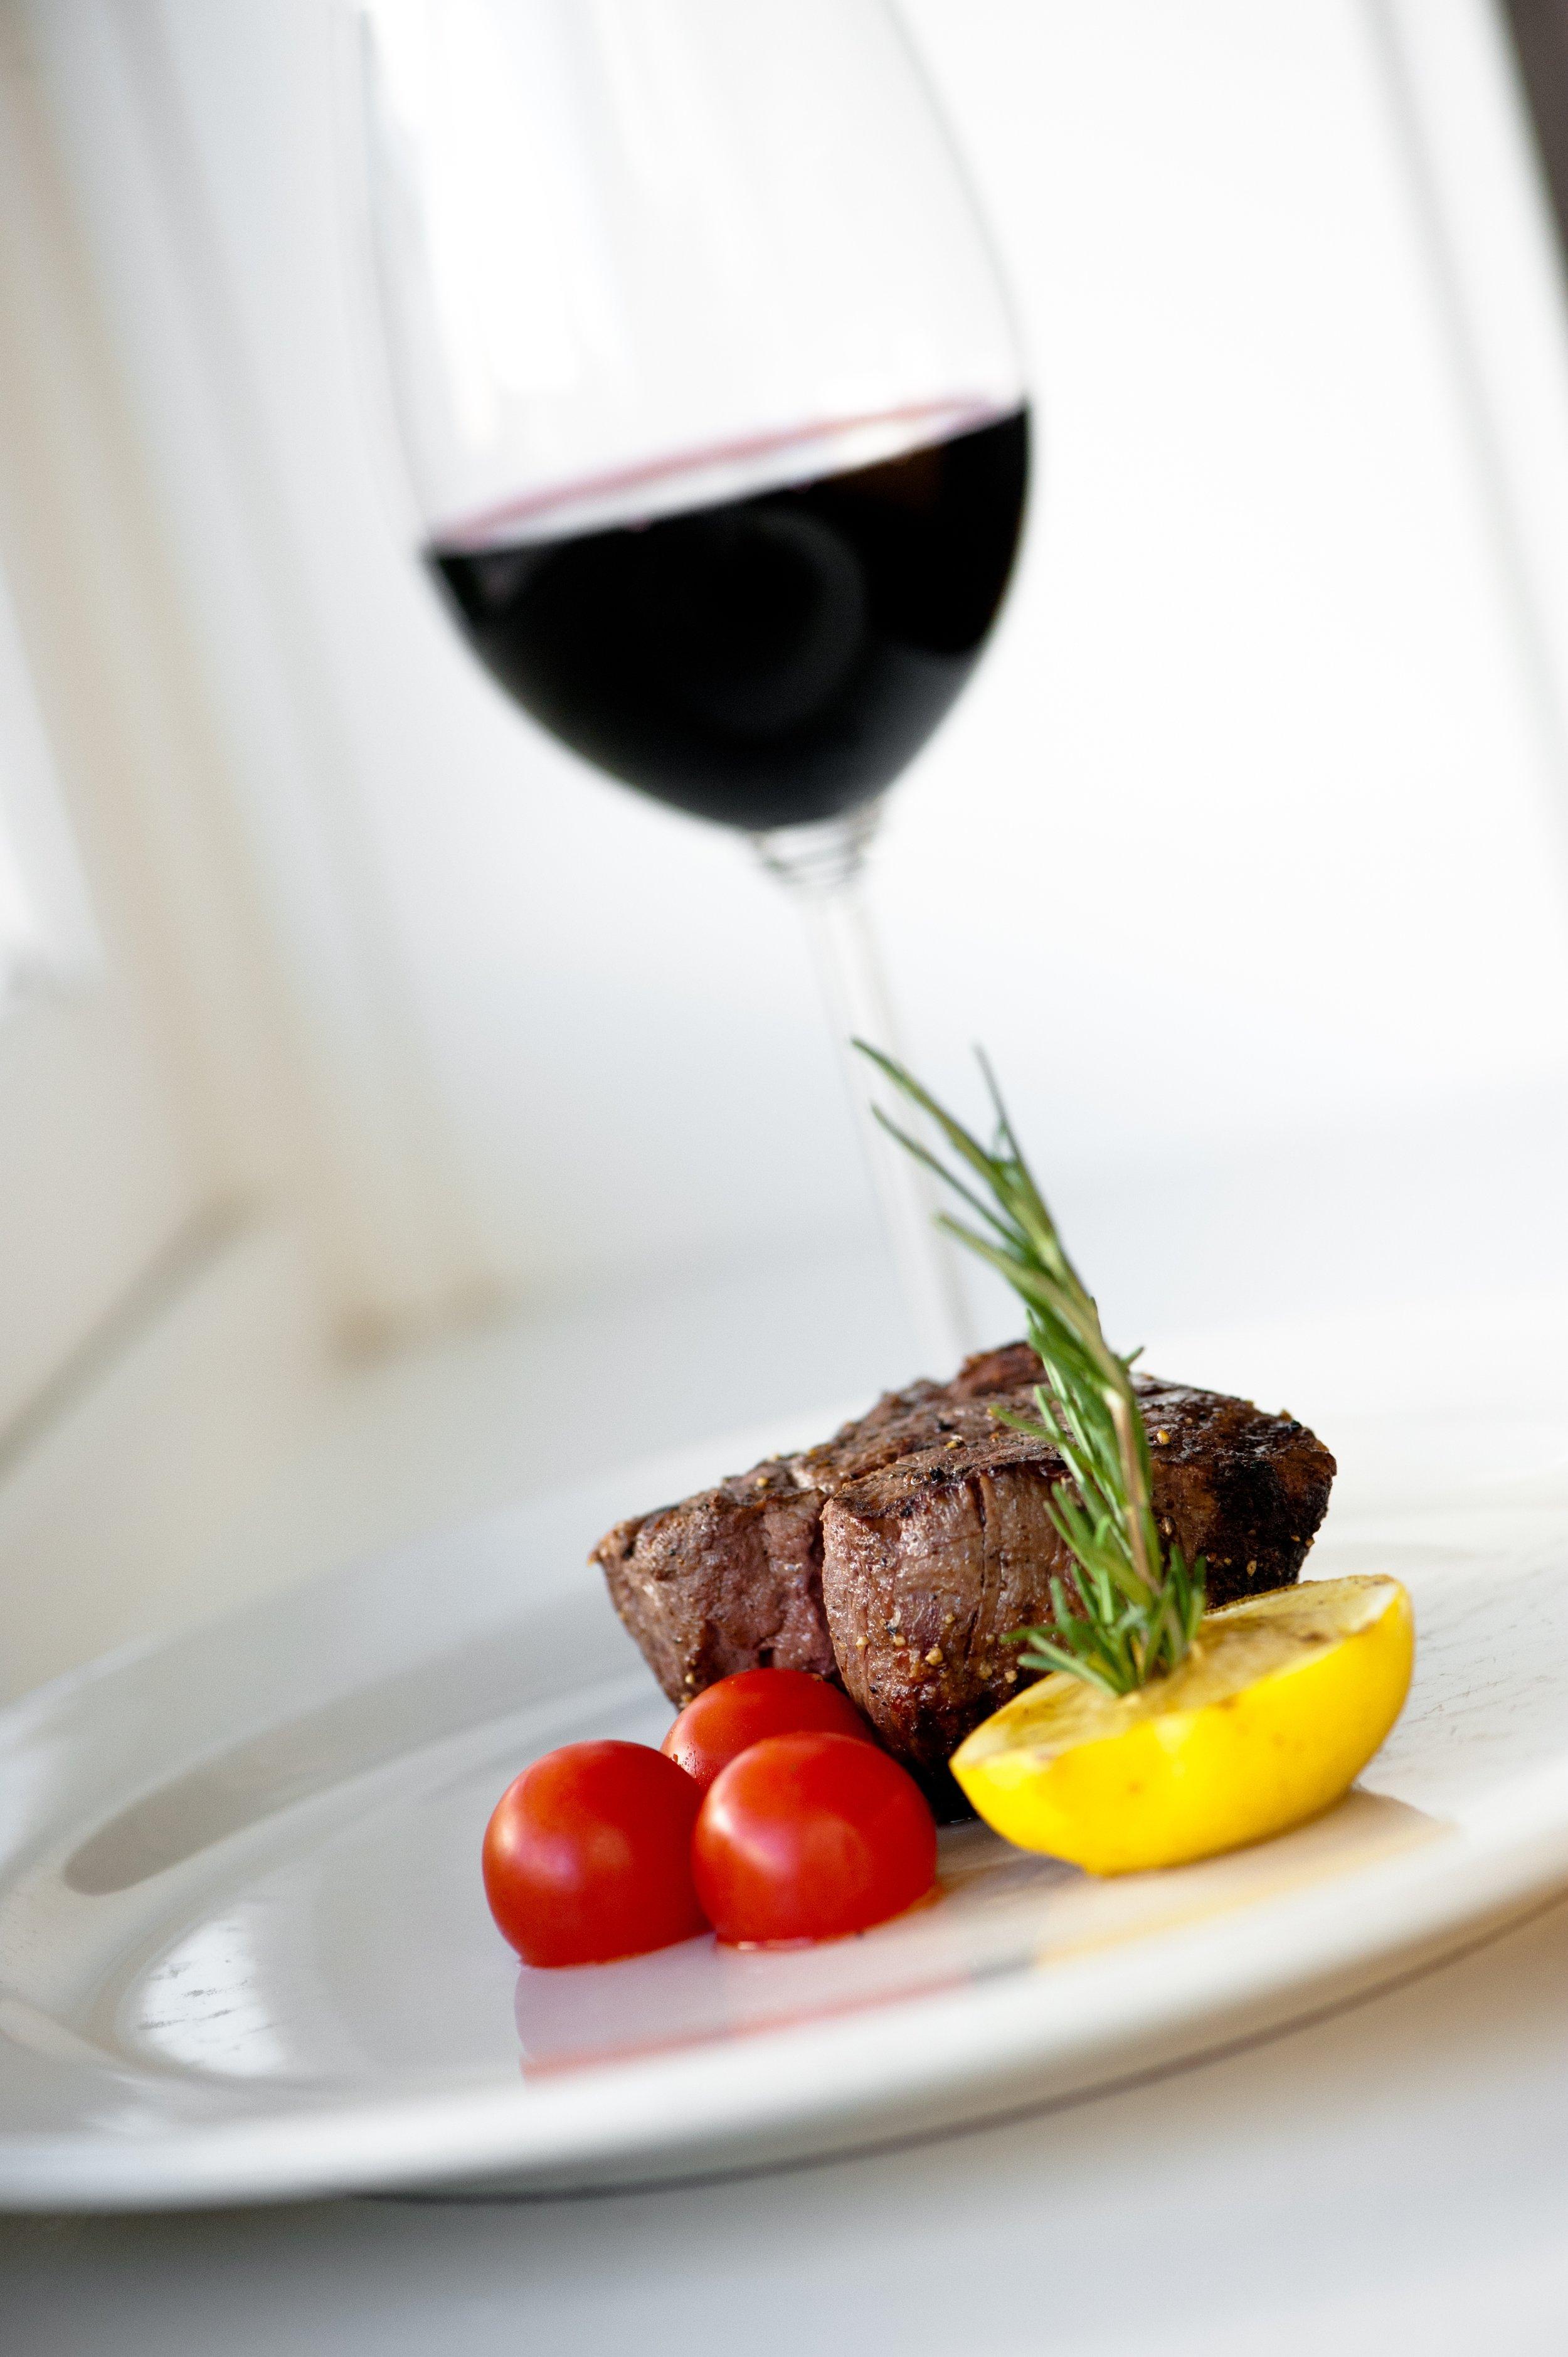 filet and wine.JPG